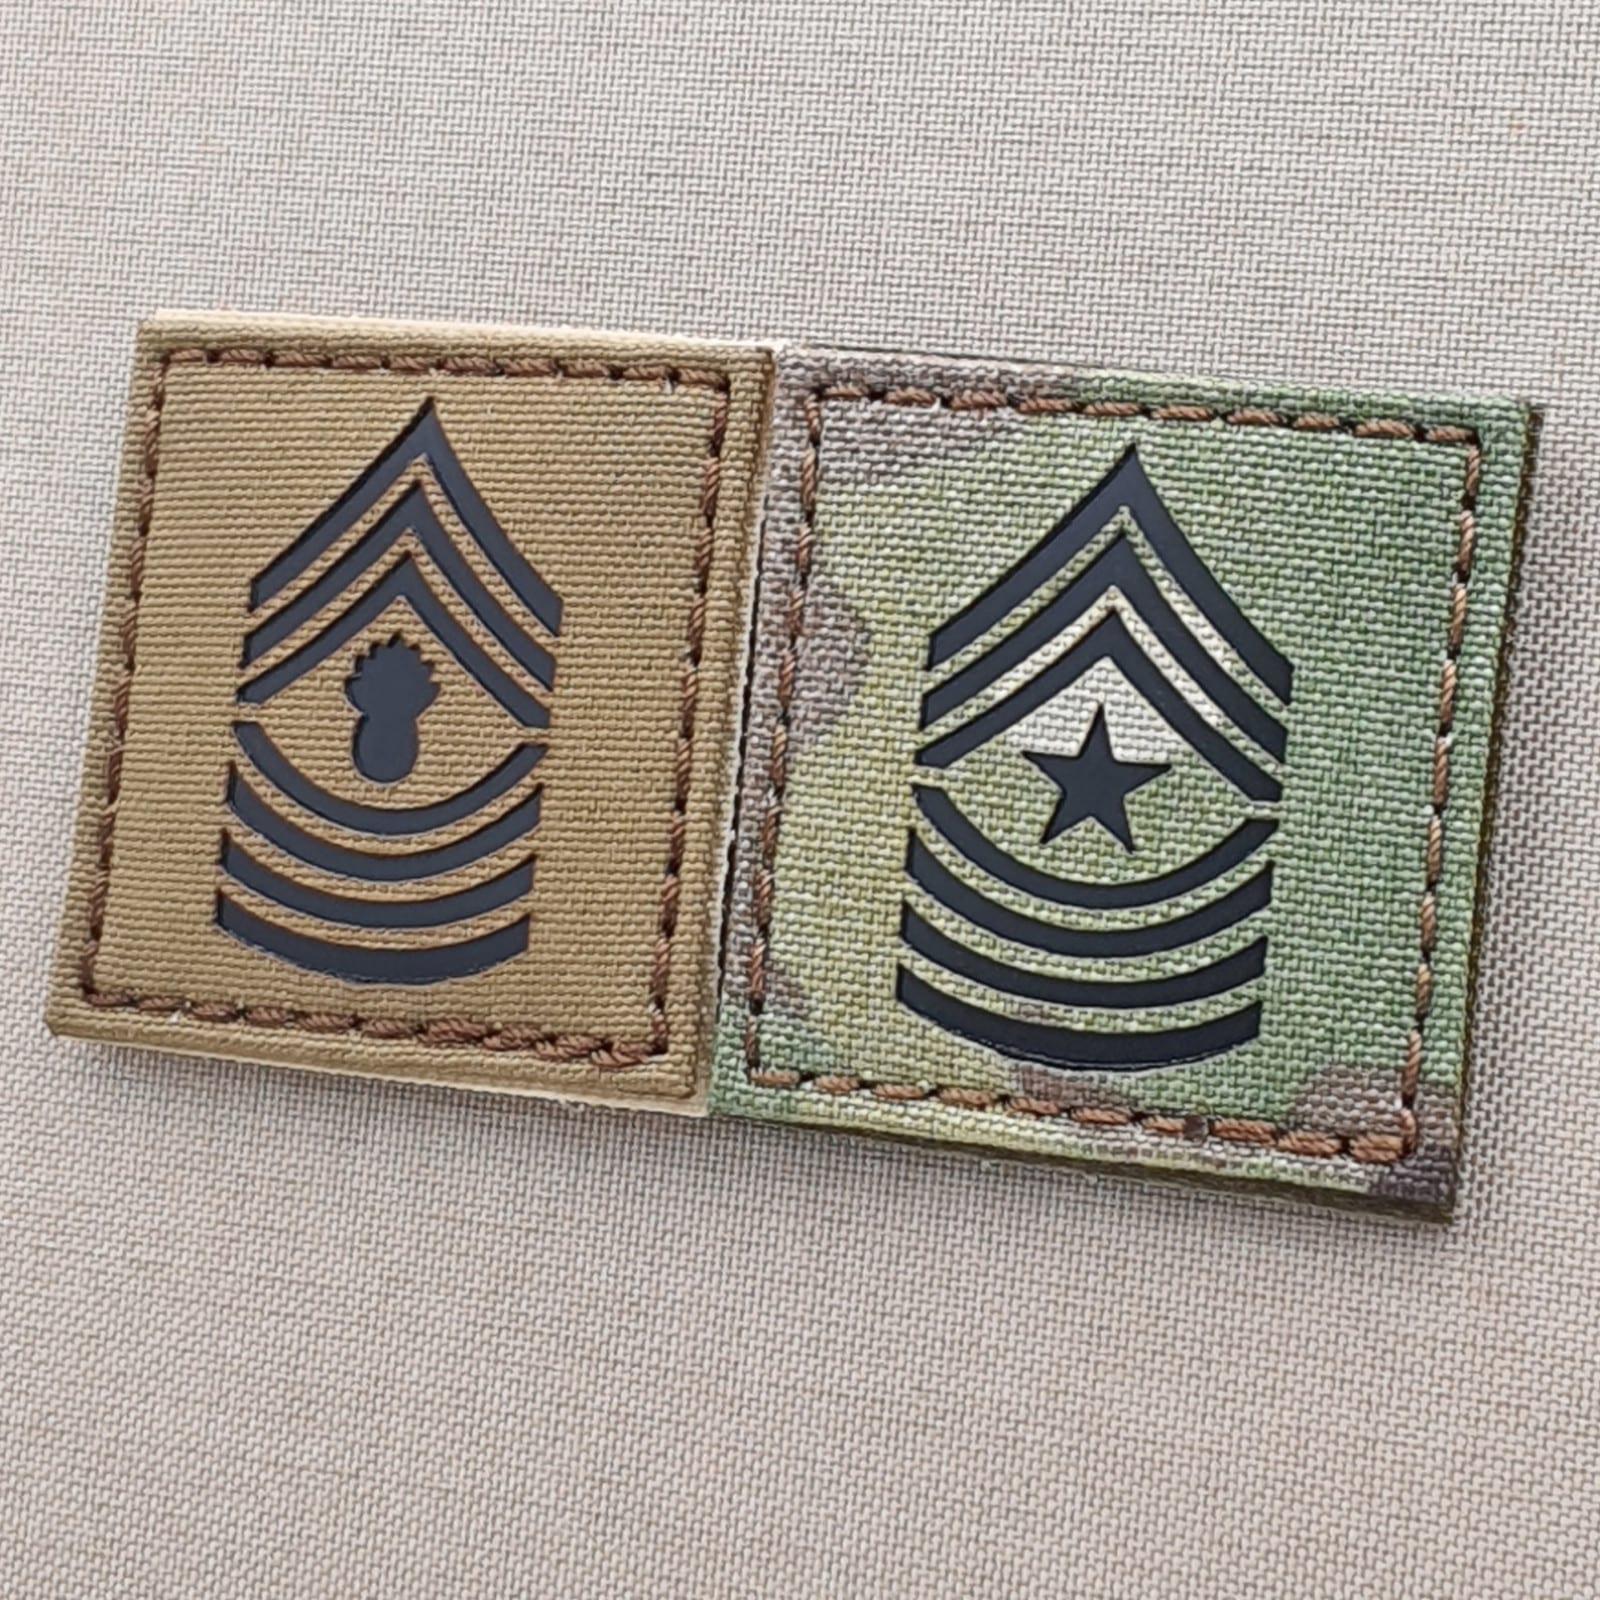 IR USMC e-8 master sergeant MGYSGT rank multicam 2x2 US marines tactical patch